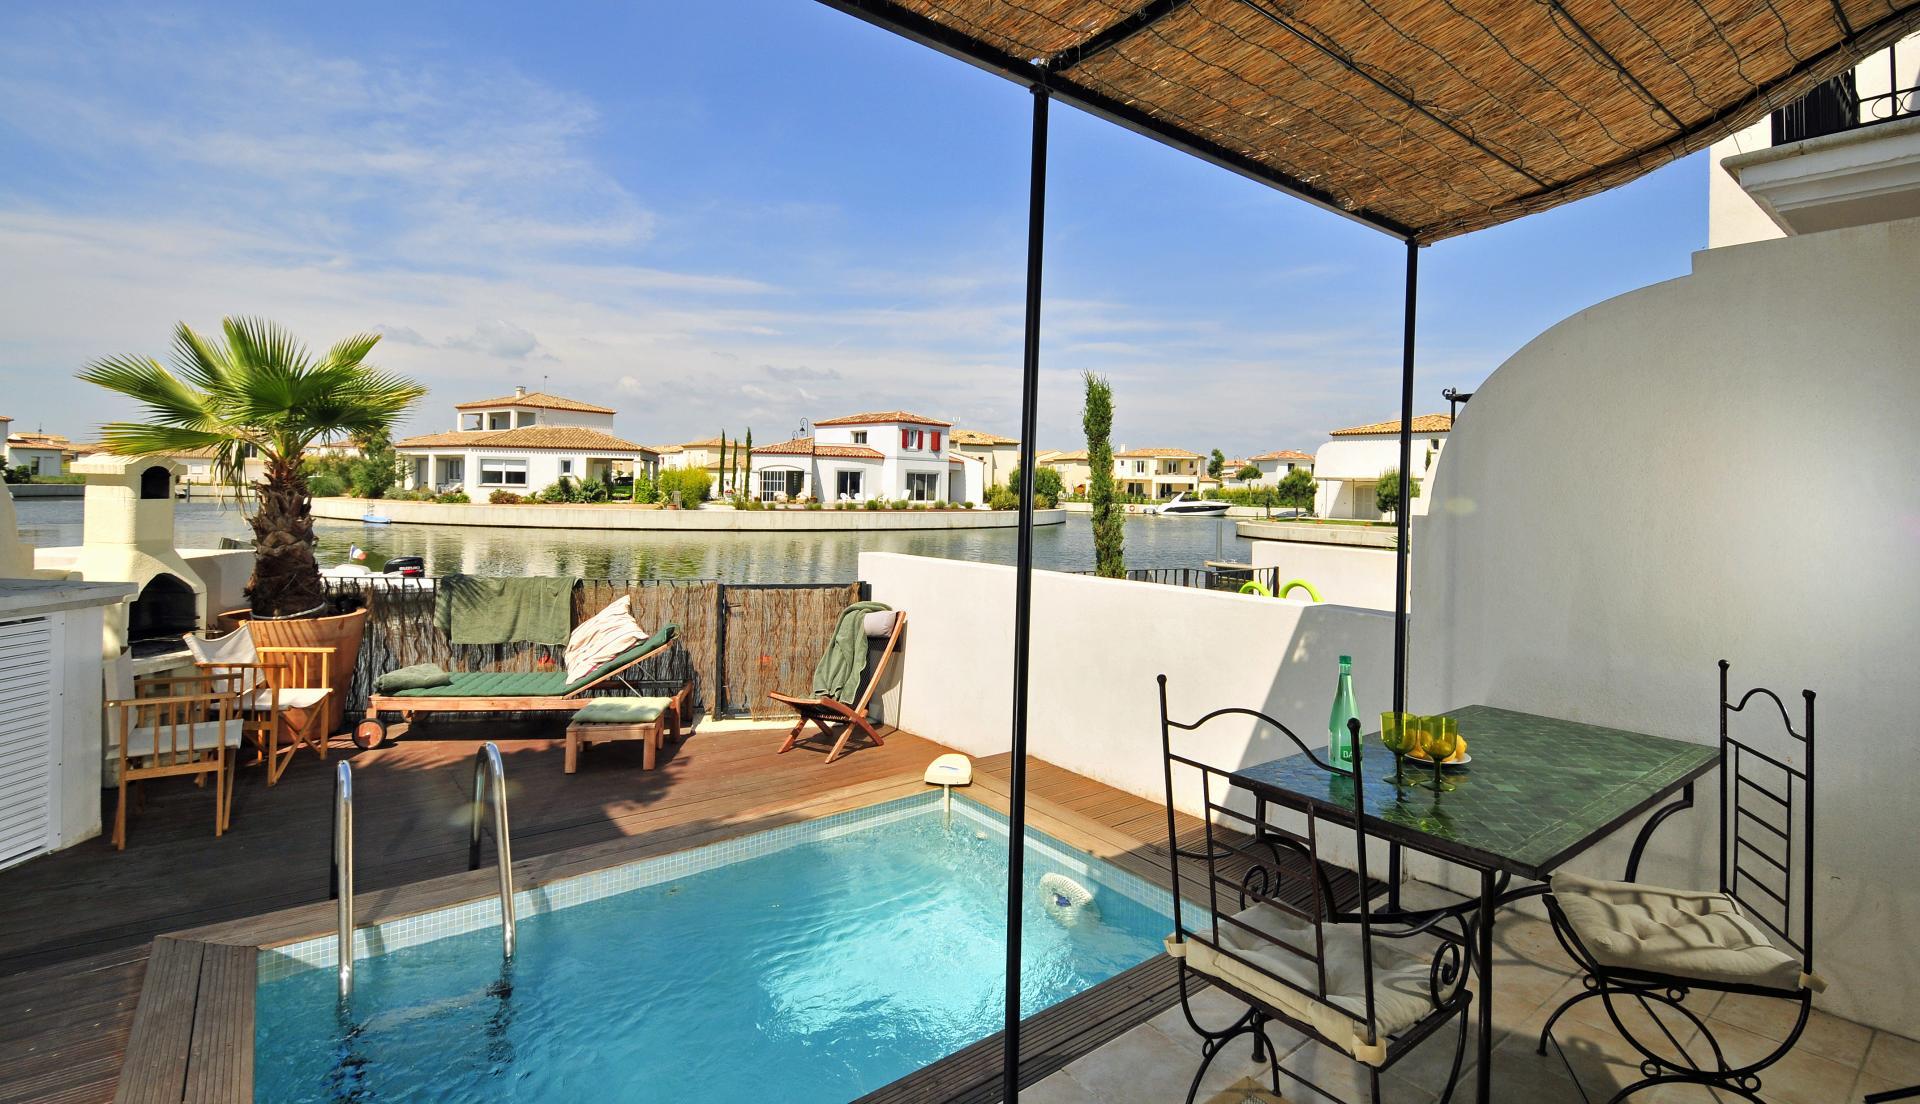 Pool Area, La Maison Occitane, Aigues Mortes, Provence.